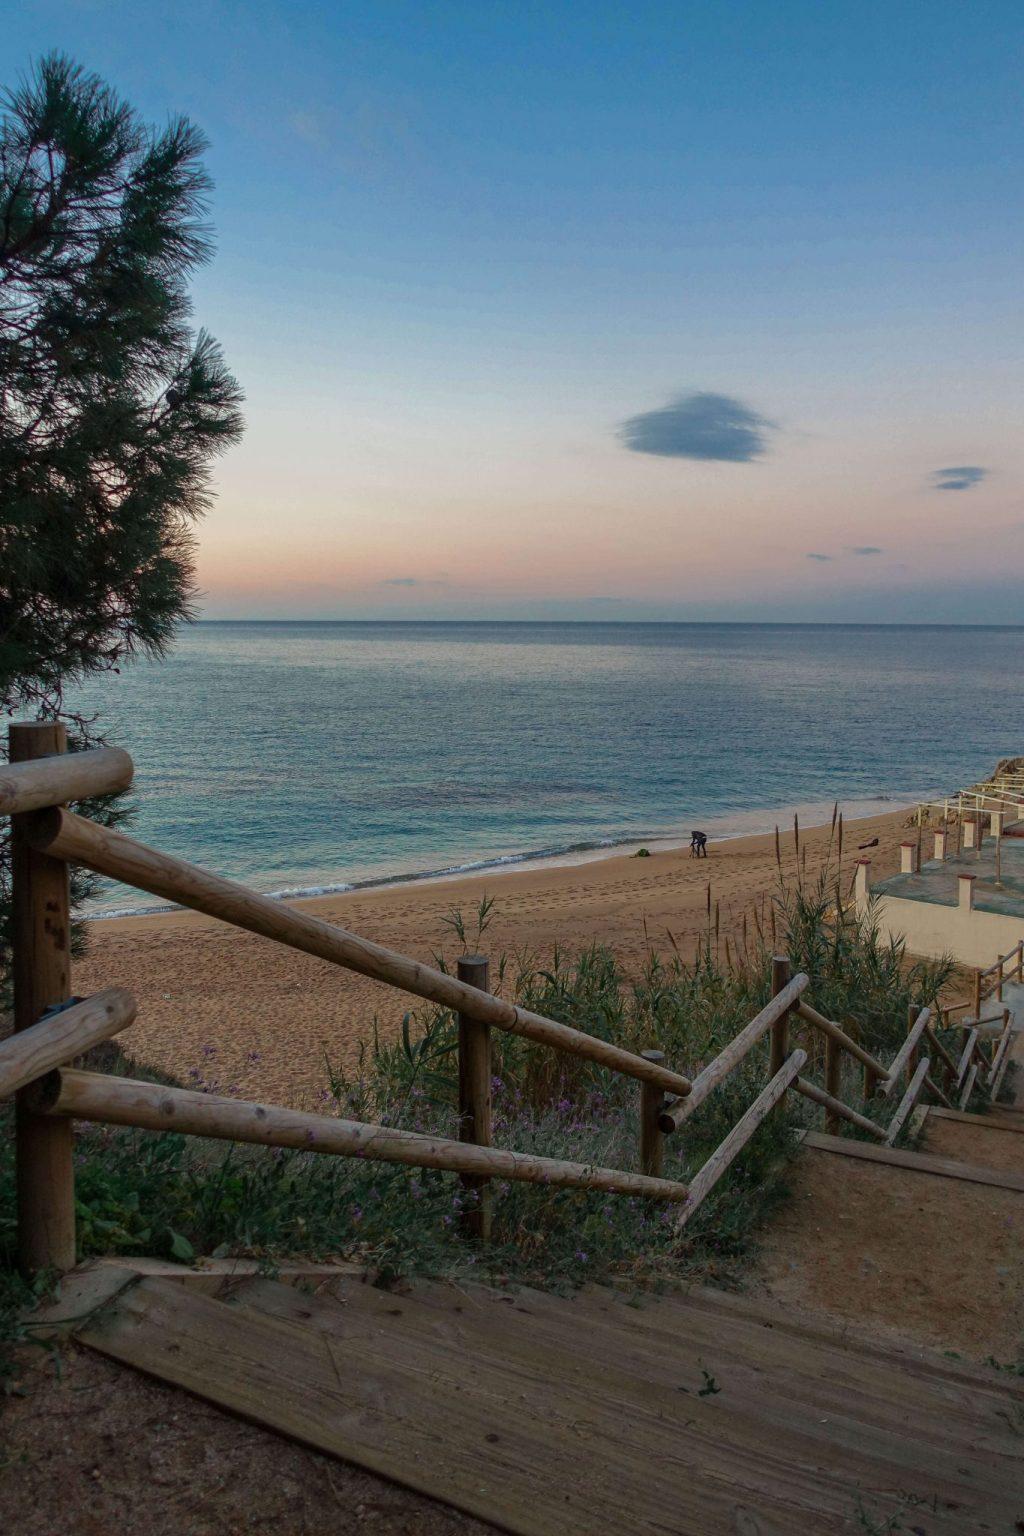 calella-roca-grossa-strand-sonnenaufgang-treppe